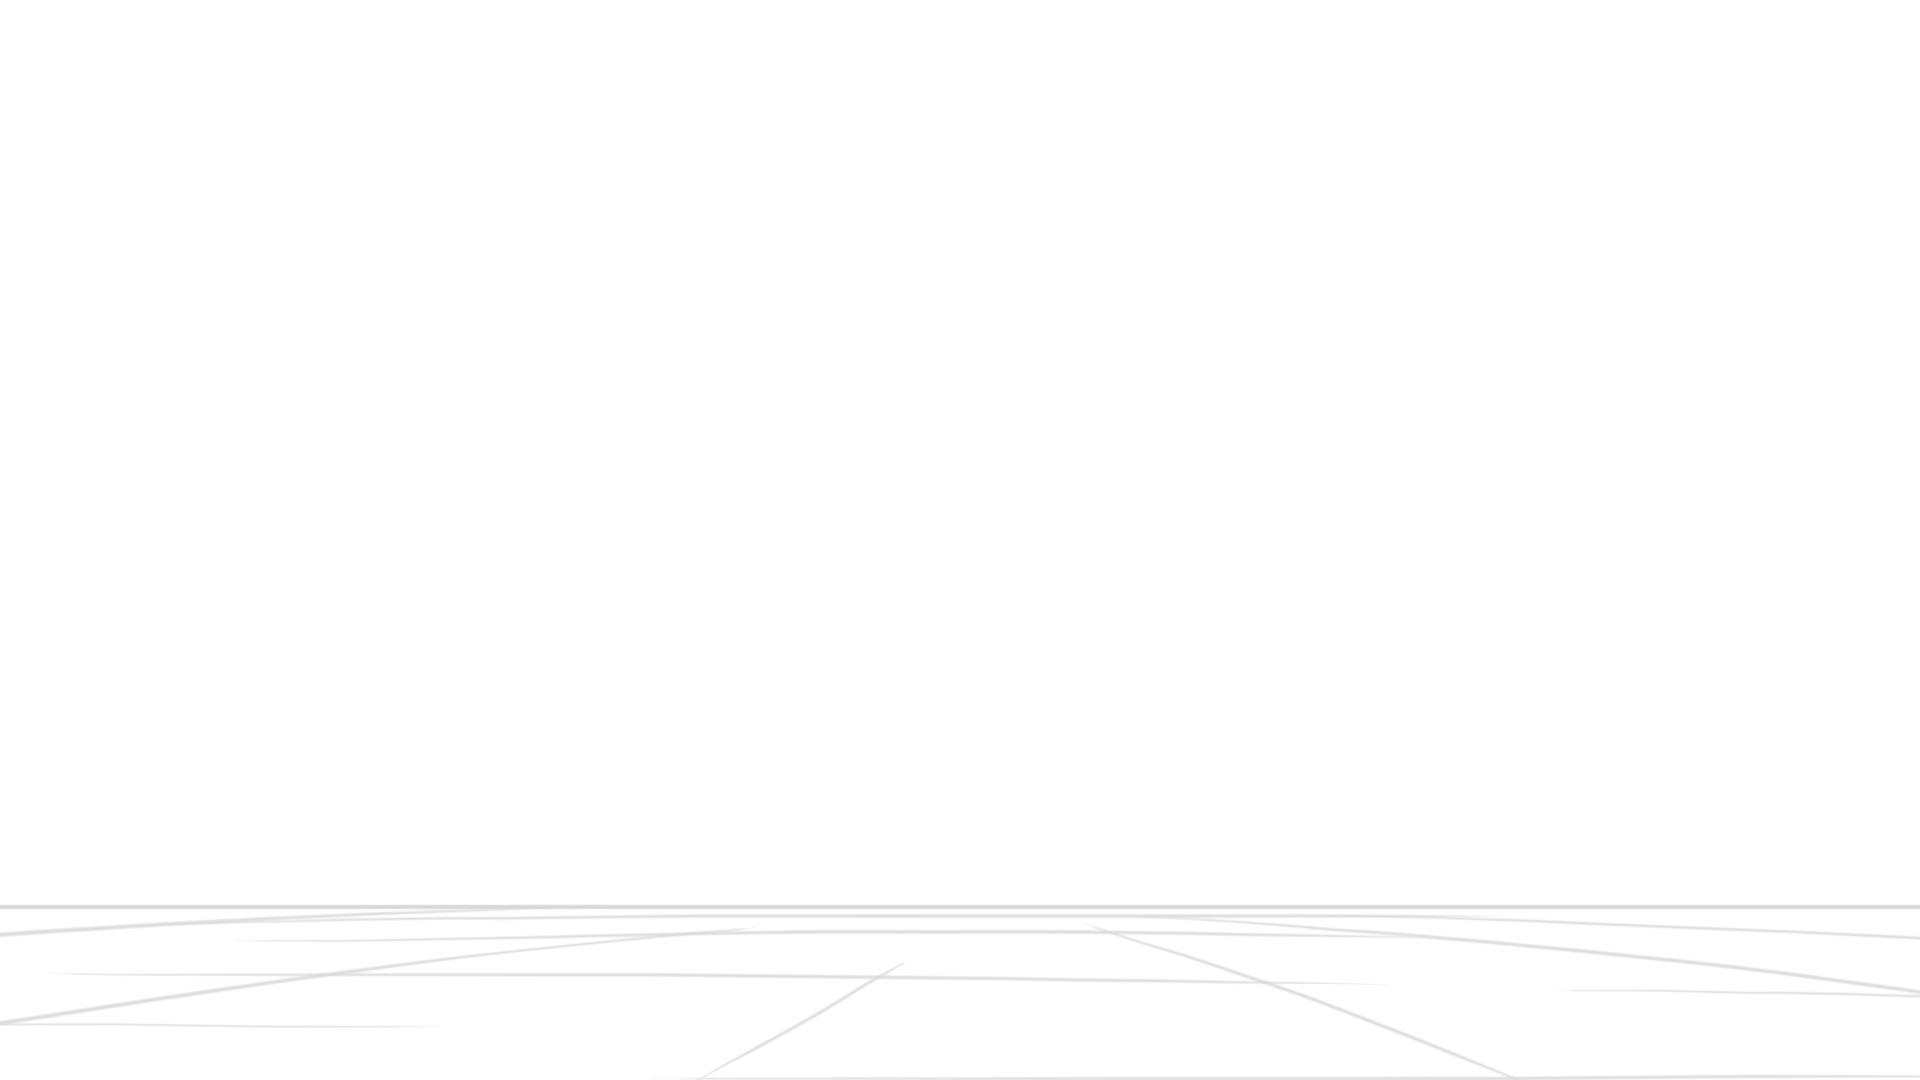 Mario-01-15.jpg